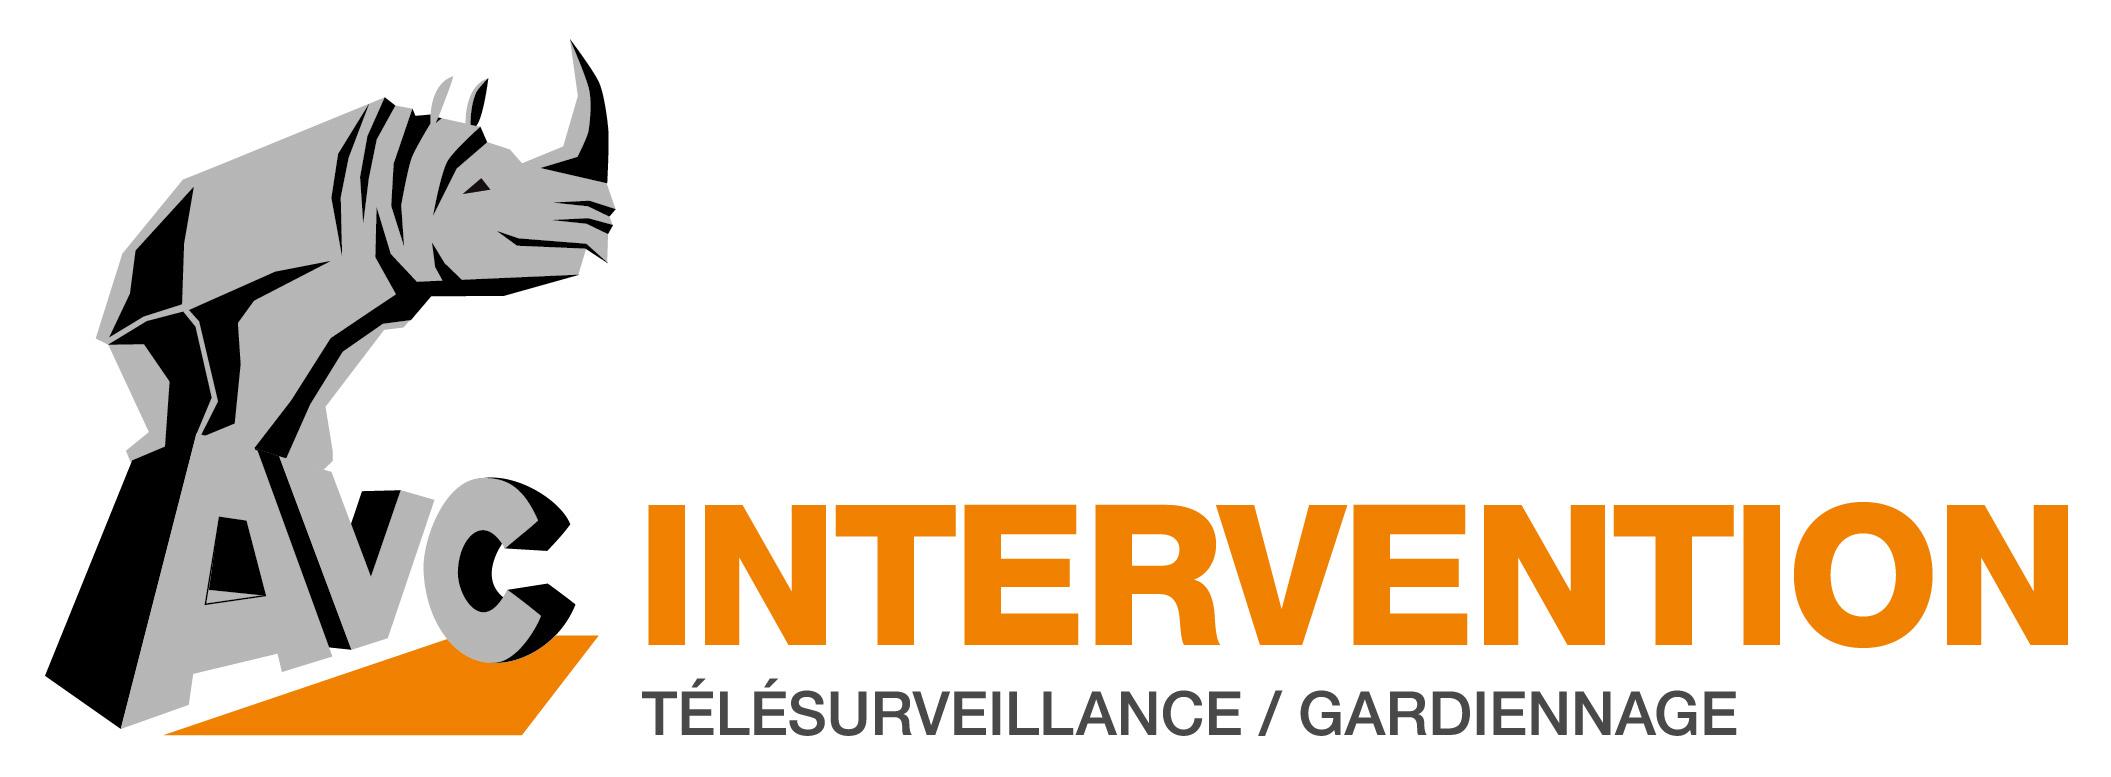 AVC Intervention